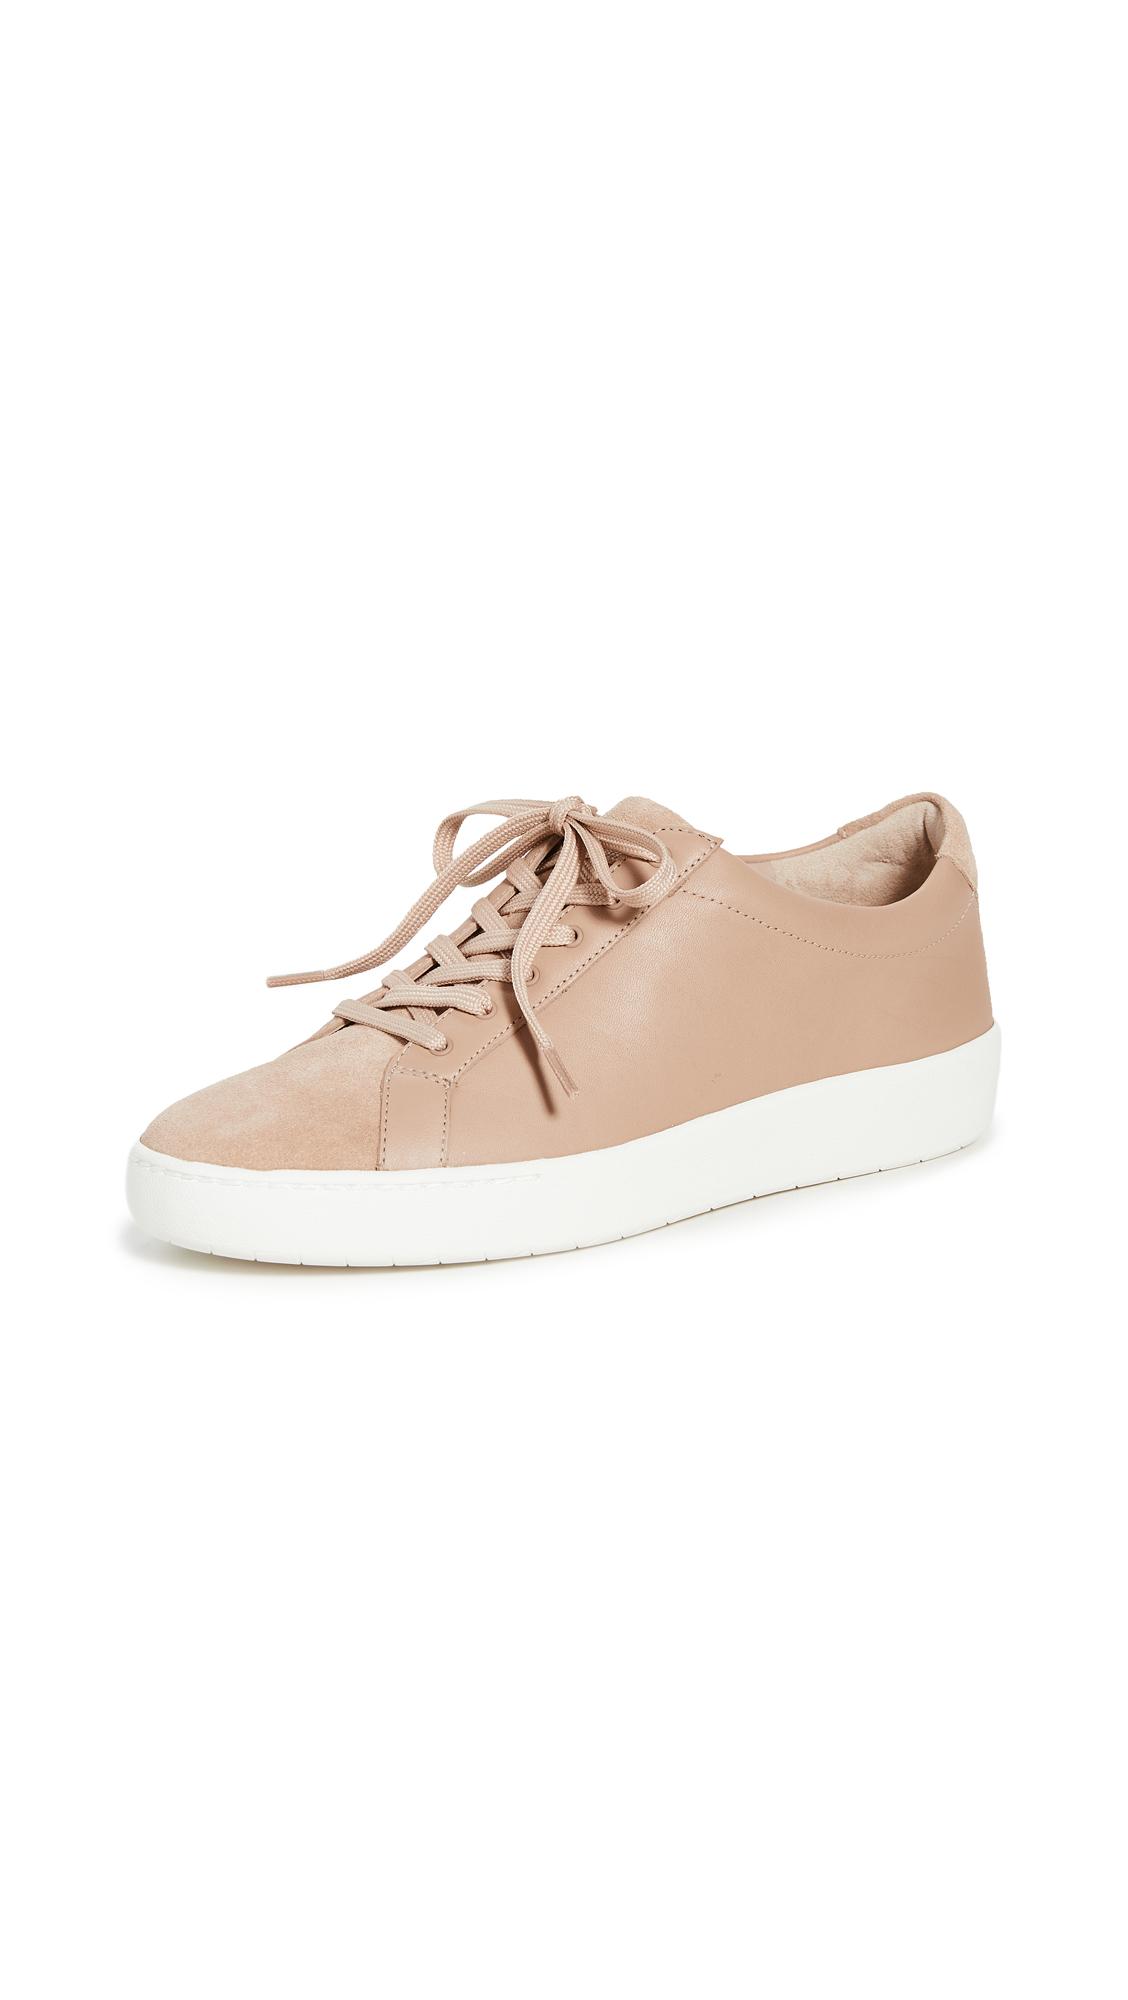 Buy Vince Janna Sneakers online, shop Vince